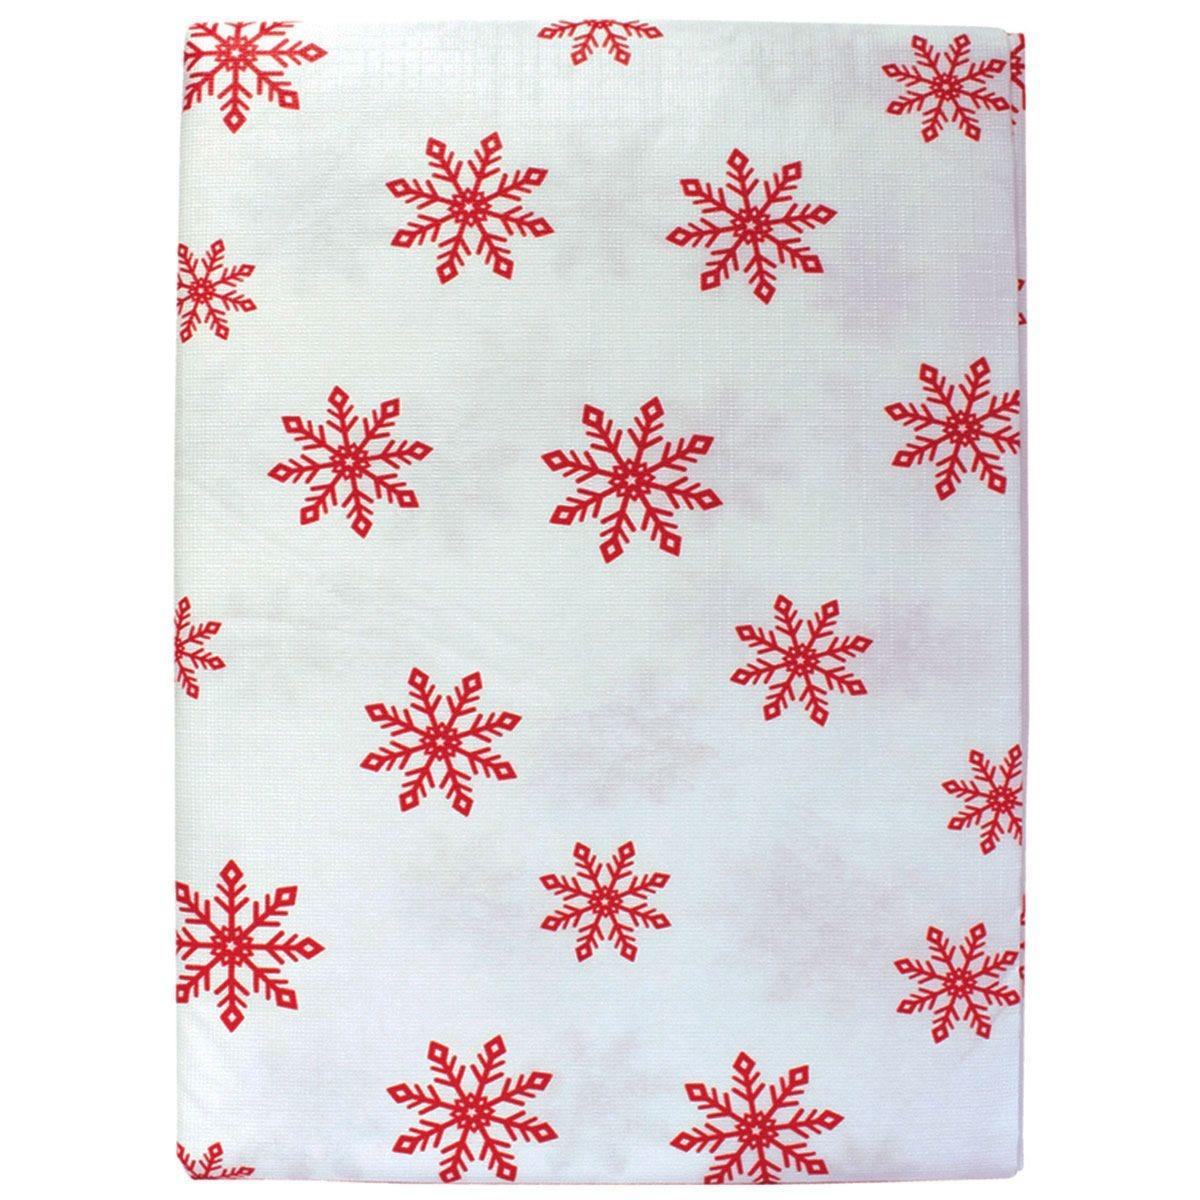 Red Snowflake Peva Tablecloth